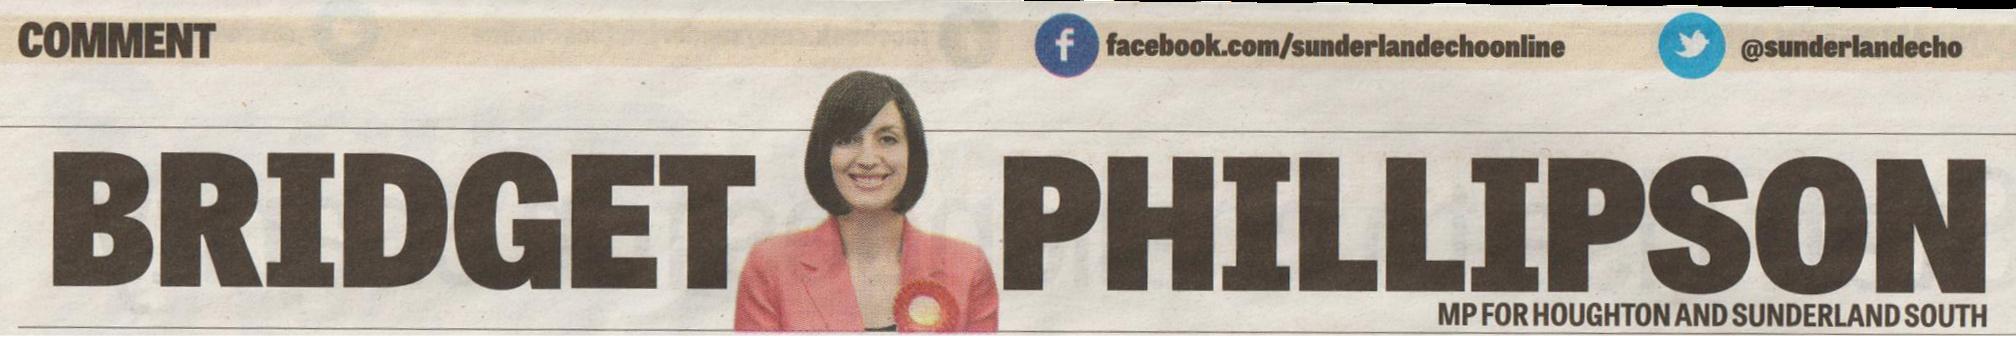 Sunderland_Echo_Bridget_Phillipson_Banner.png